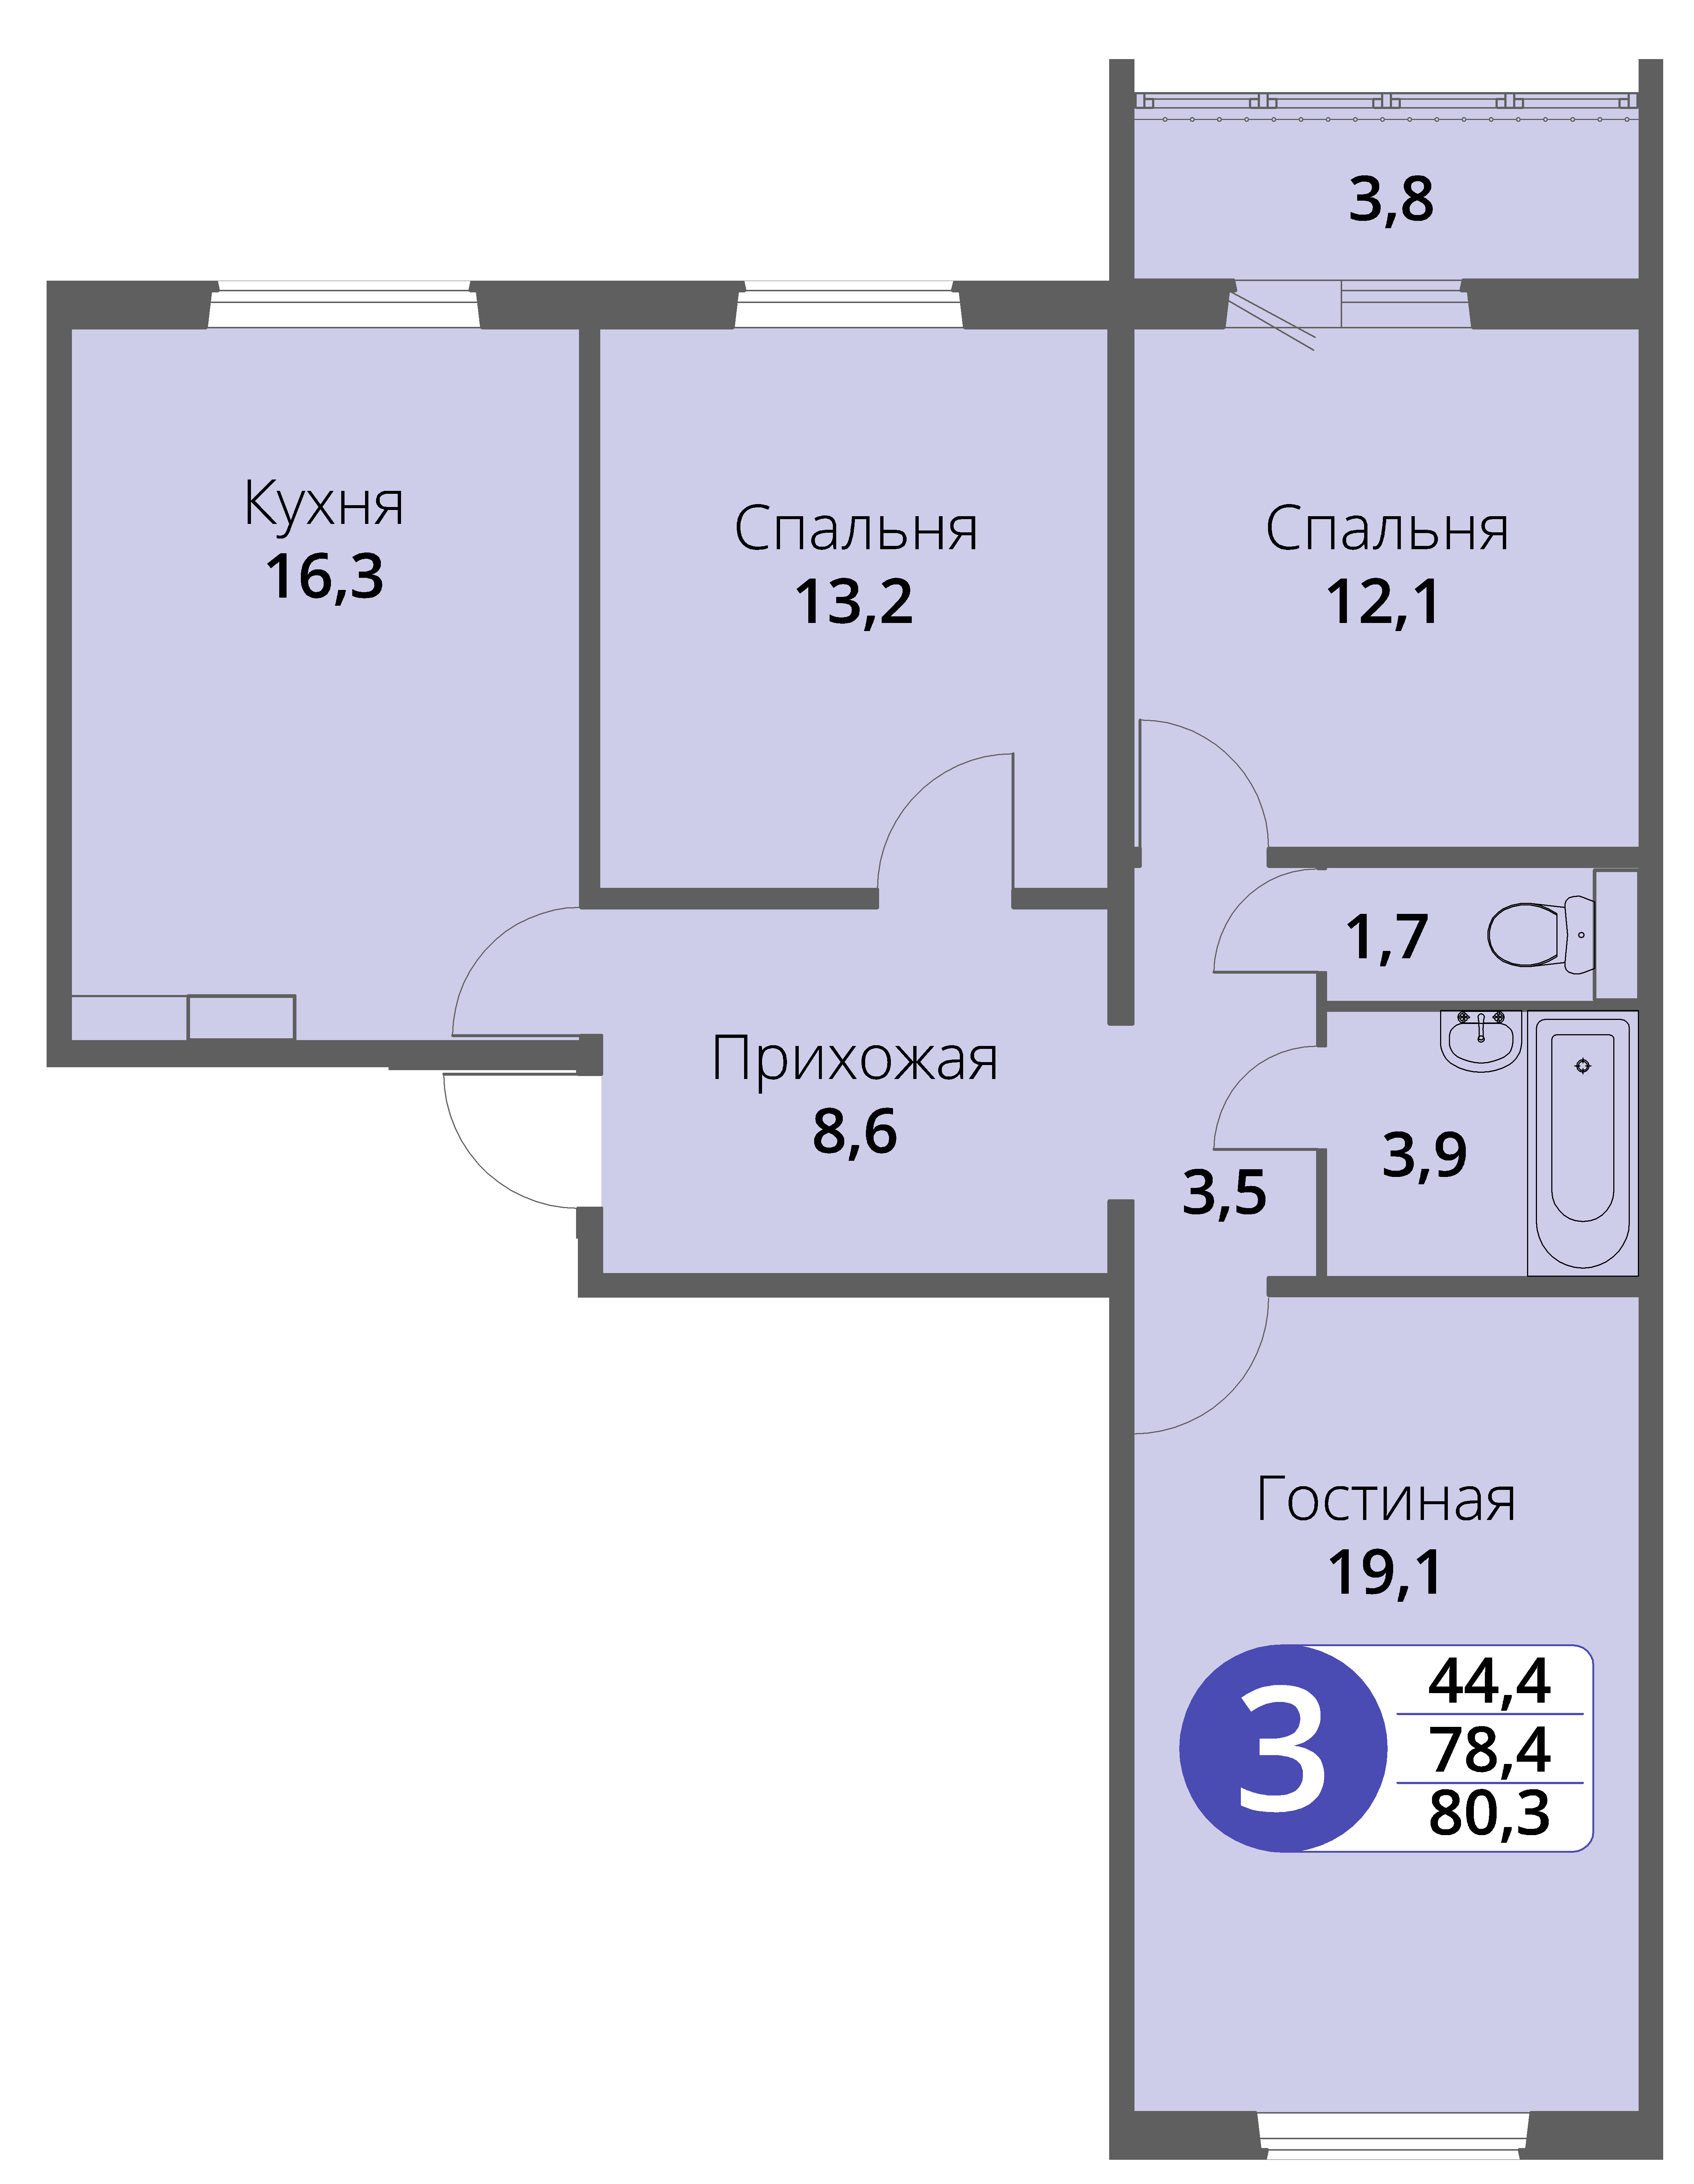 Зареченская 1-1, квартира 141 - Трехкомнатная